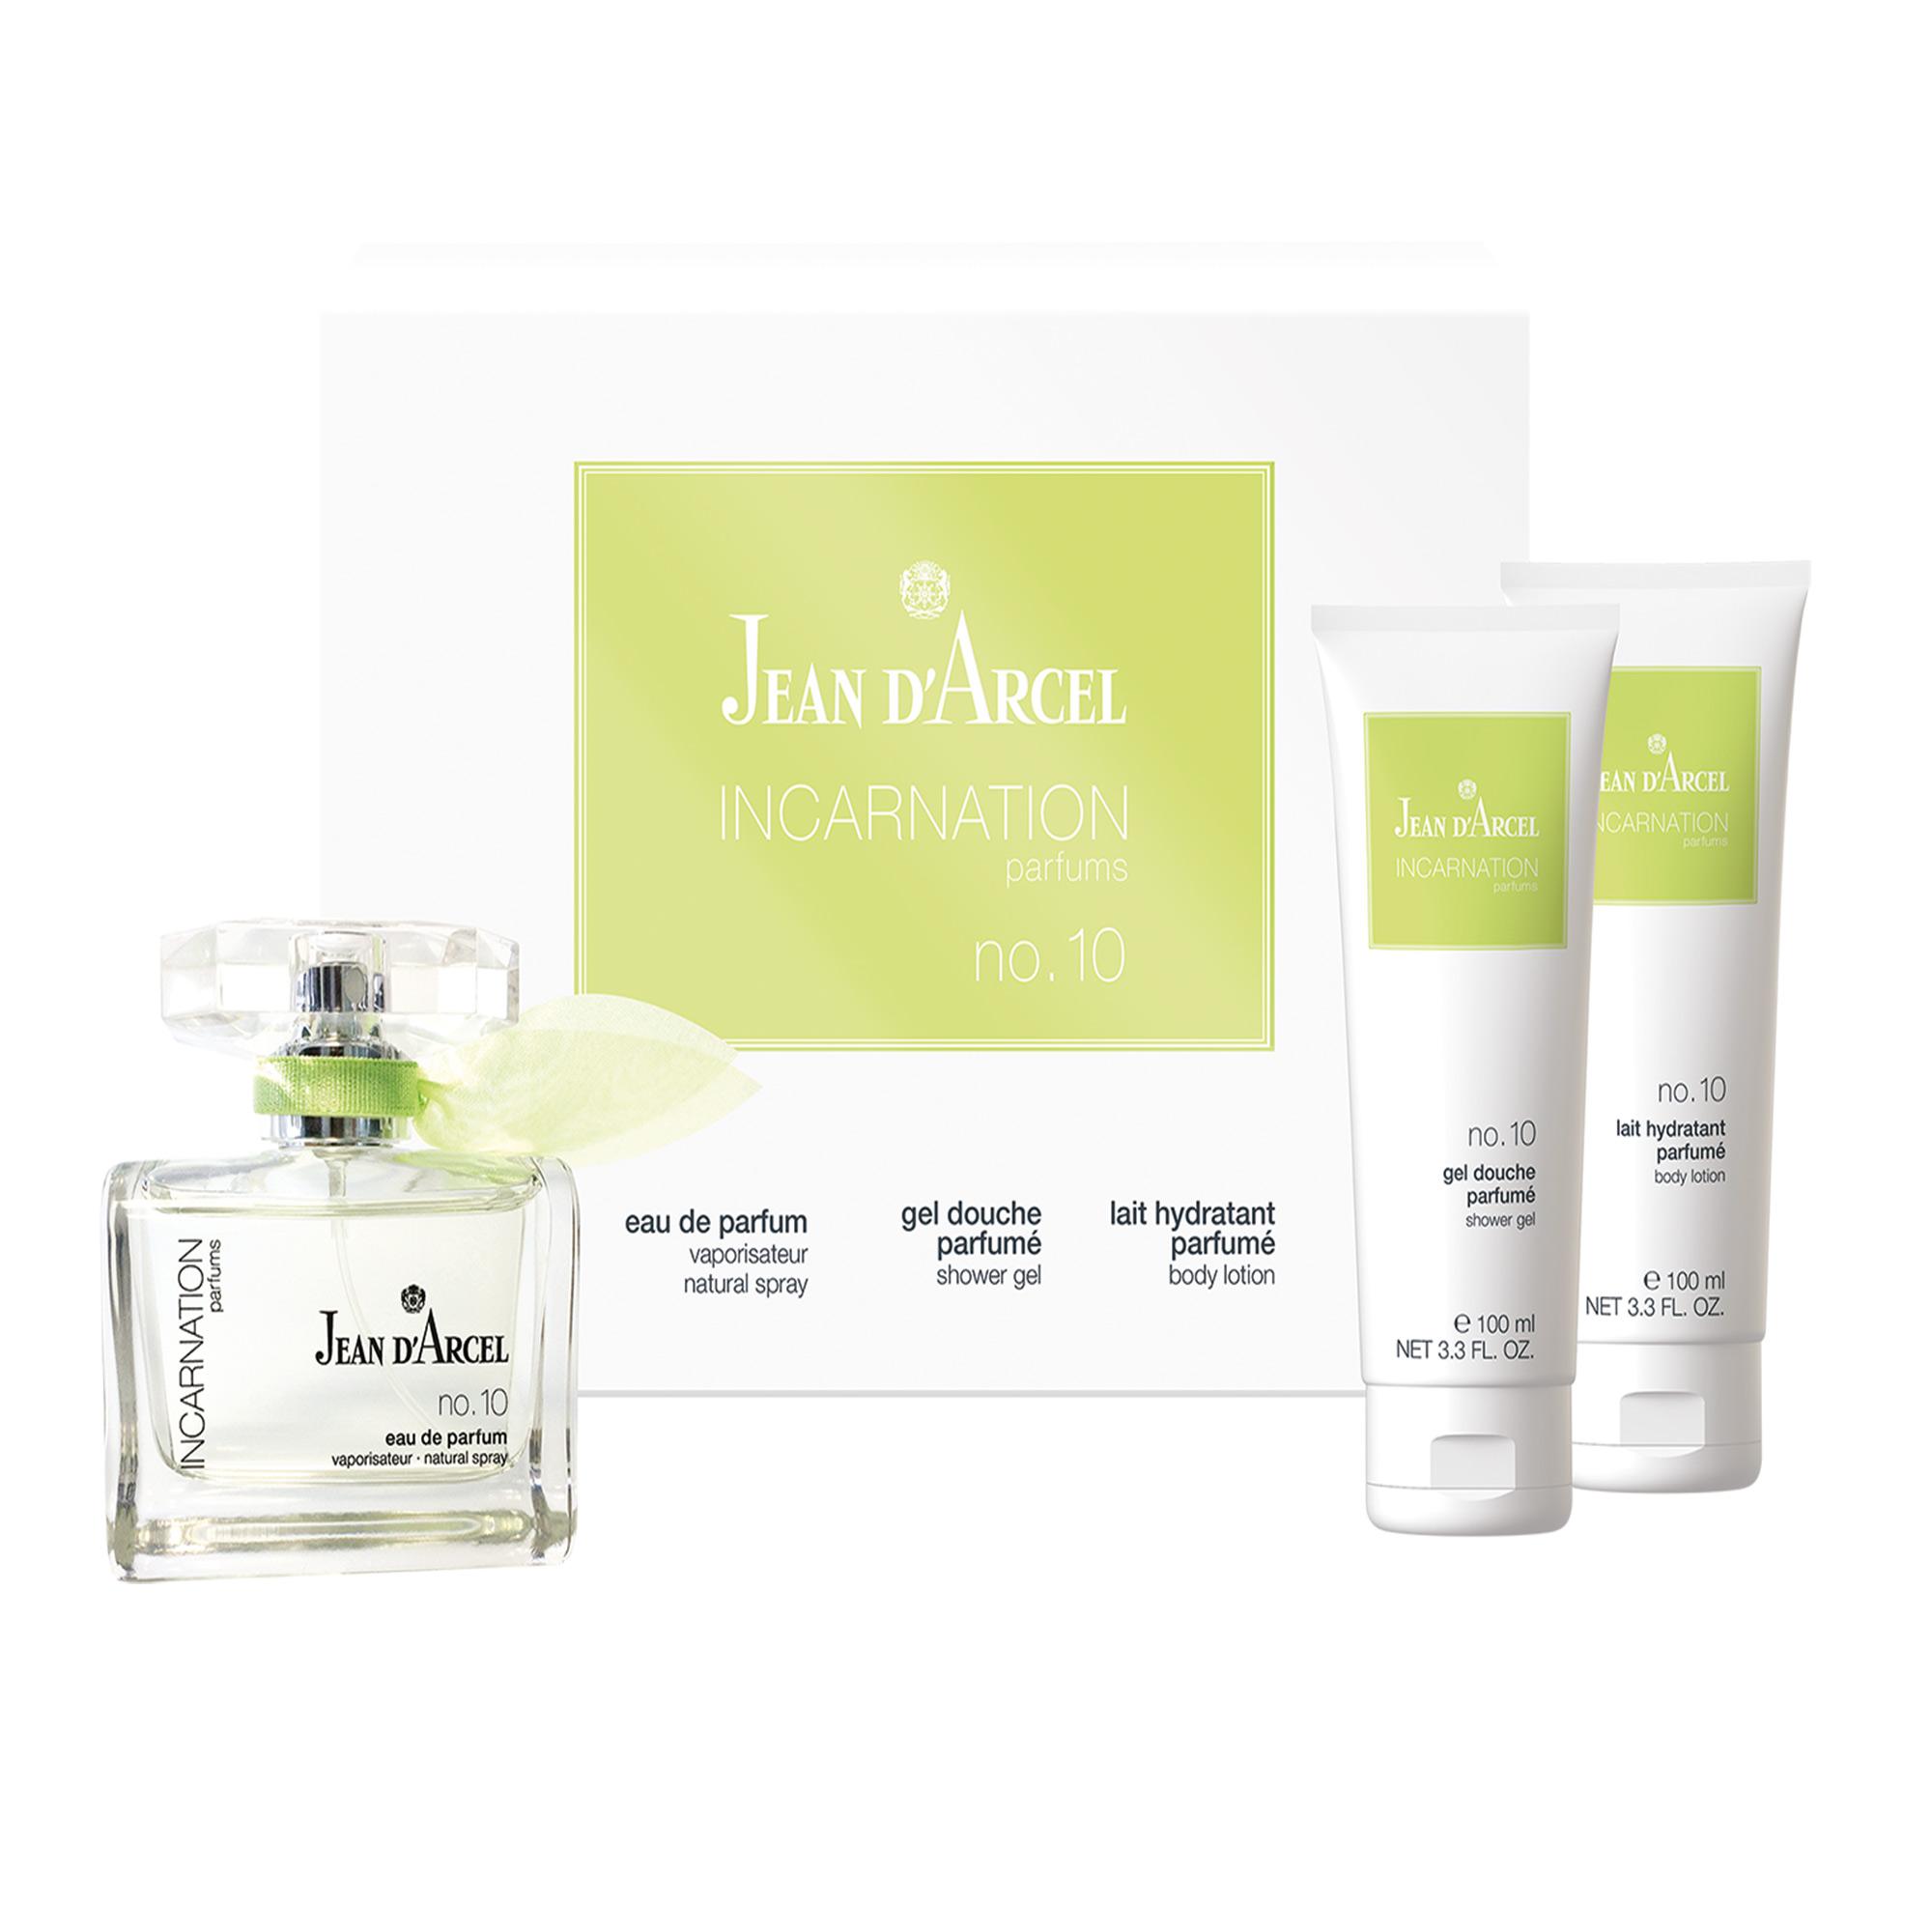 Jean D'Arcel INCARNATION parfums Nr. 10 Set